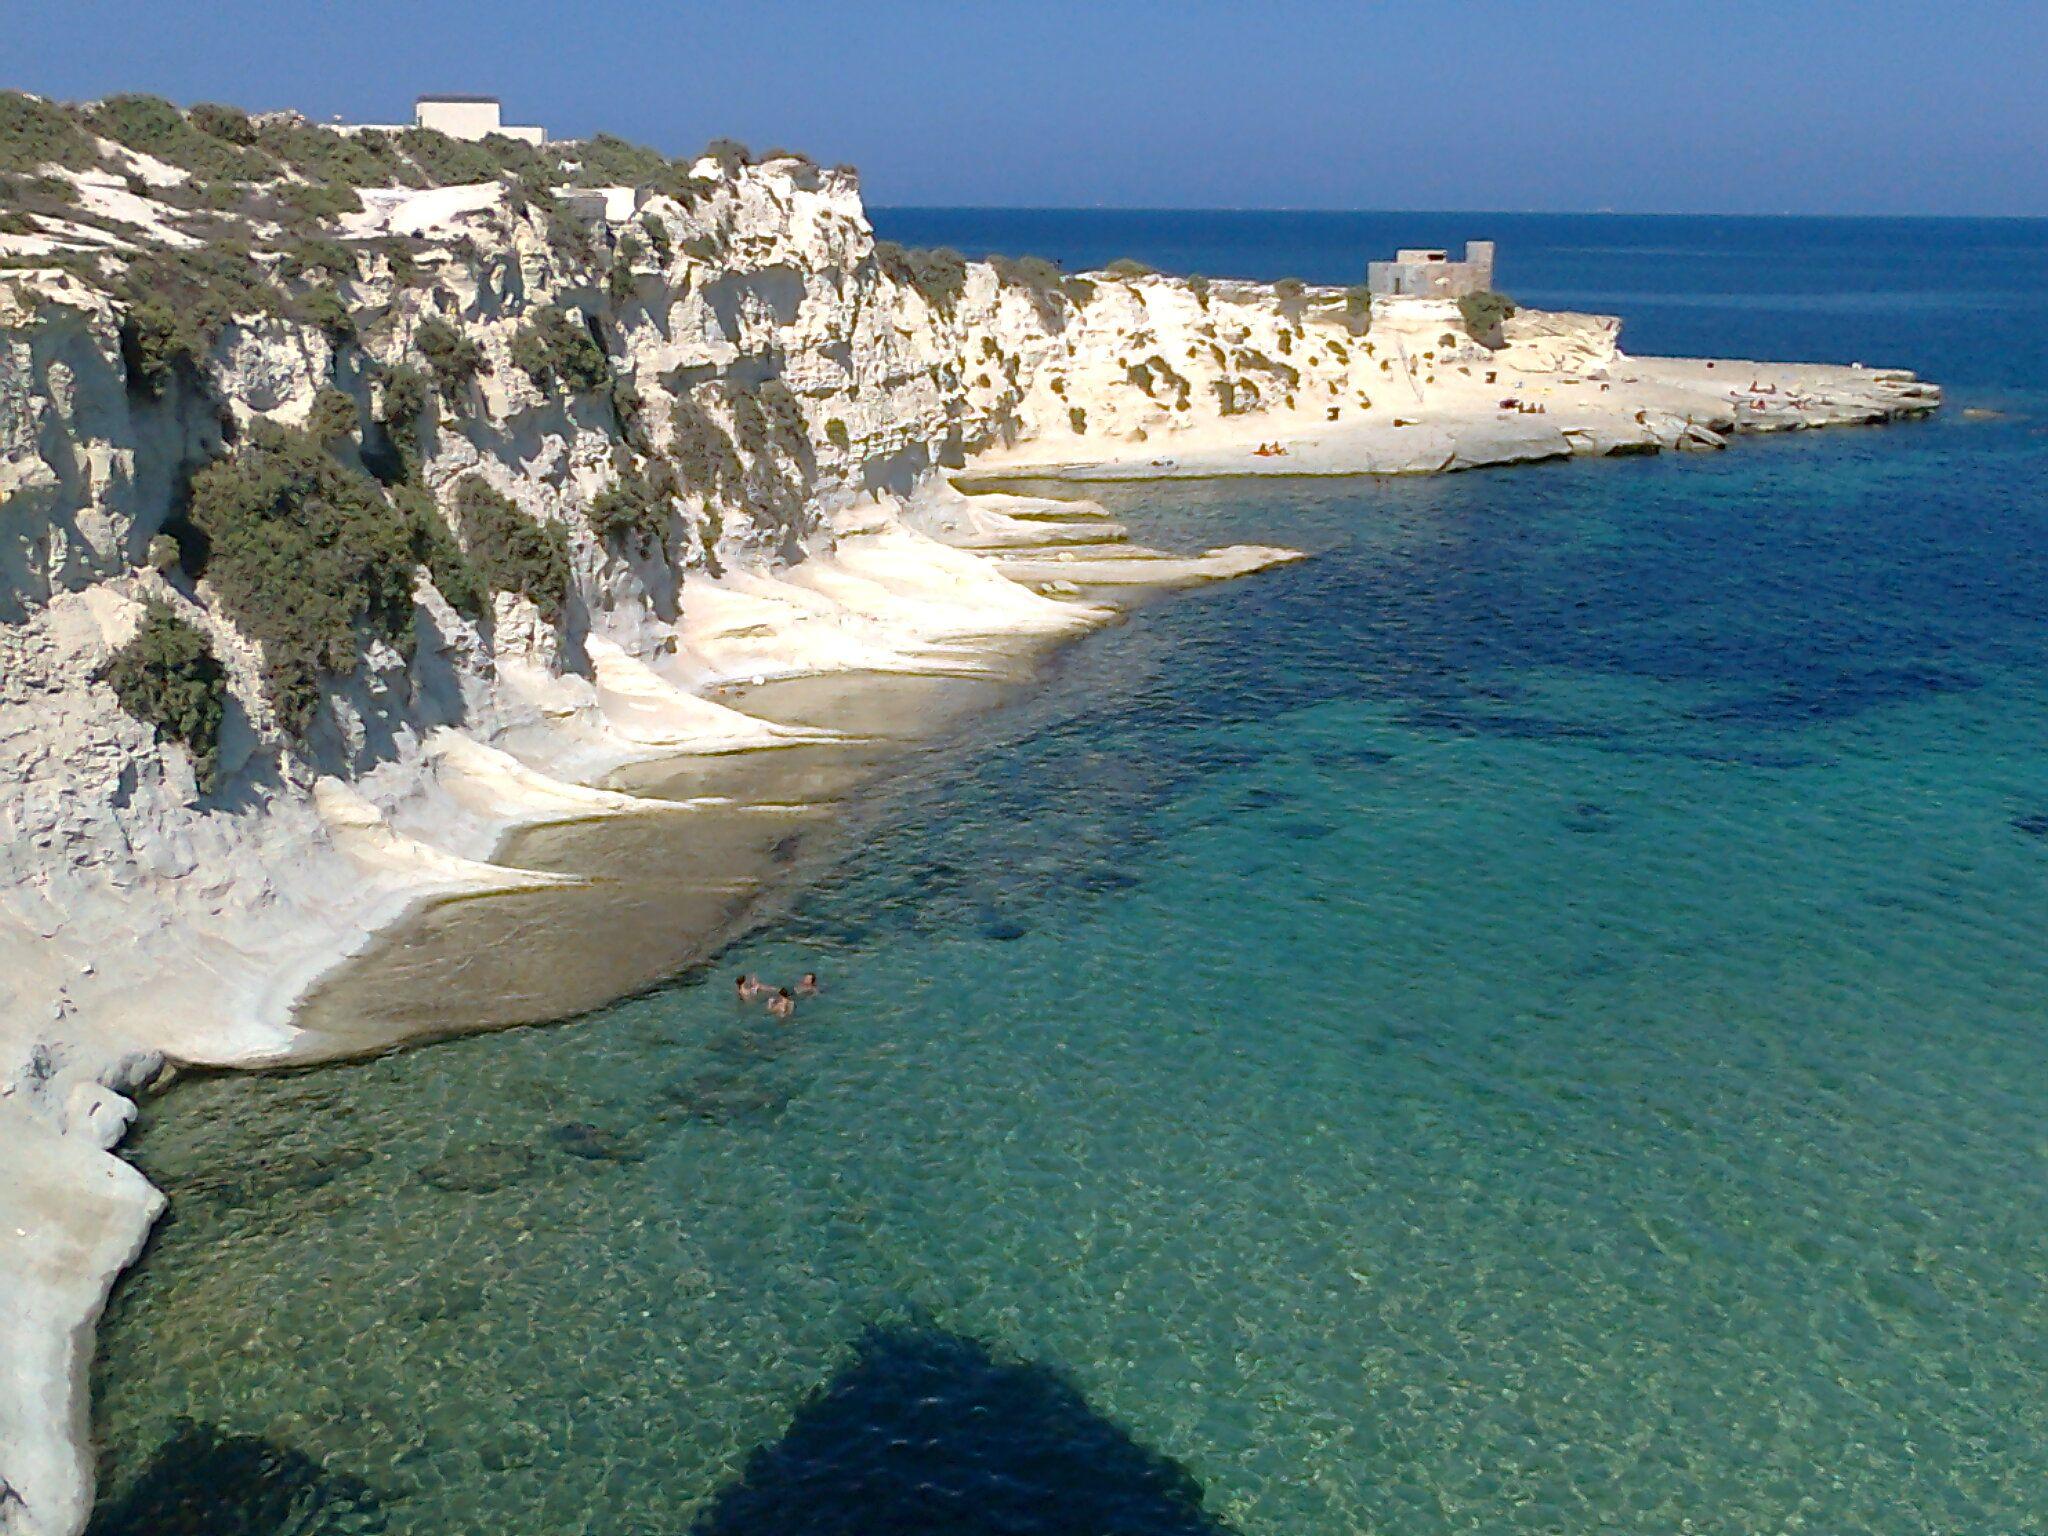 st thomas bay marsascala Malta | nature | Pinterest ...